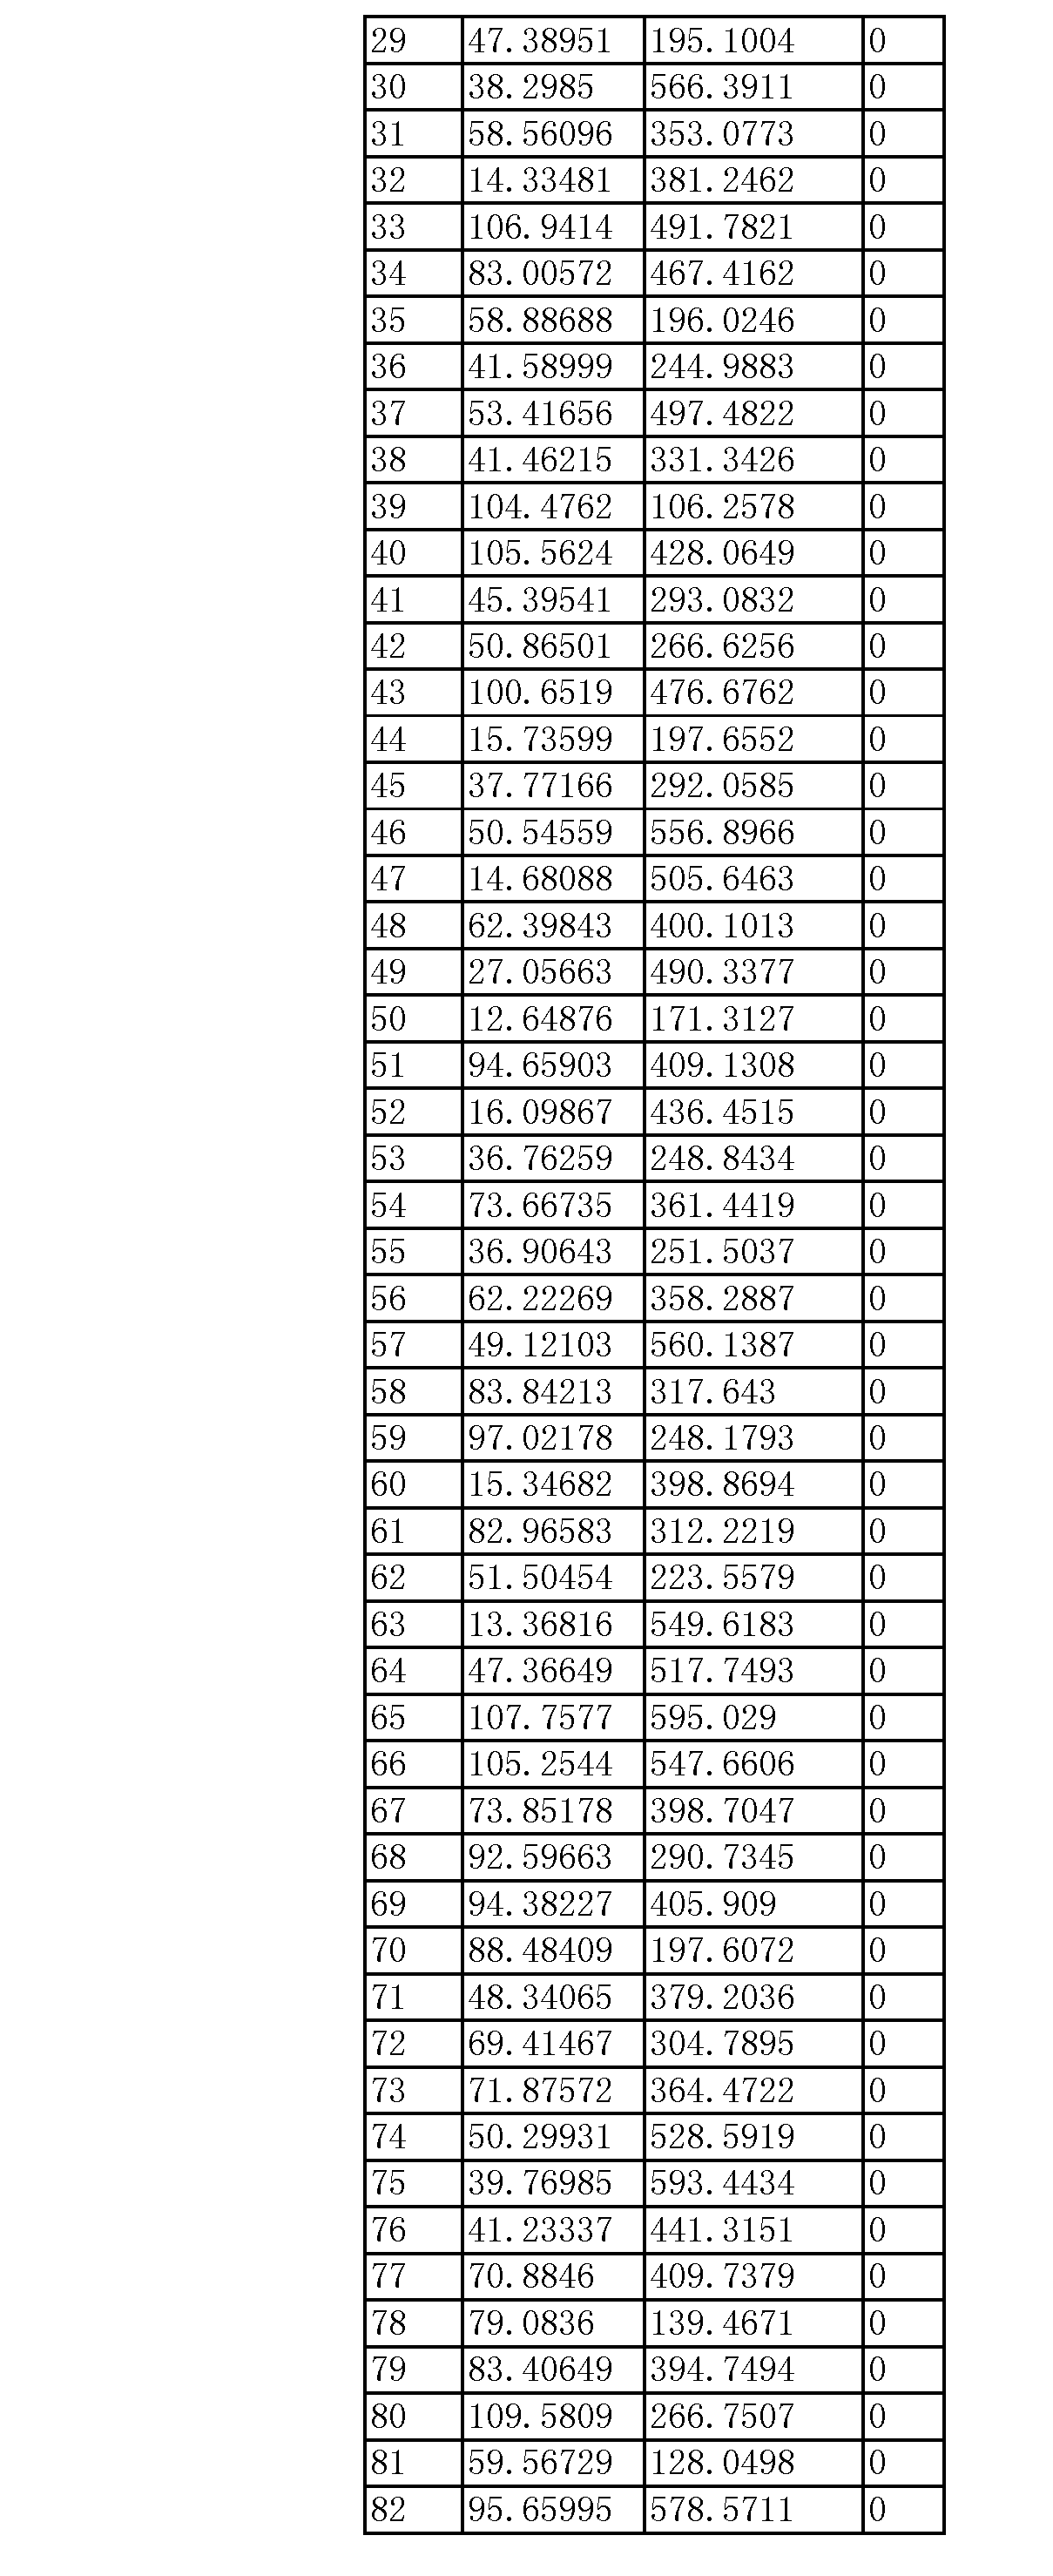 CN104634309A - 智能机载测亩仪- Google Patents